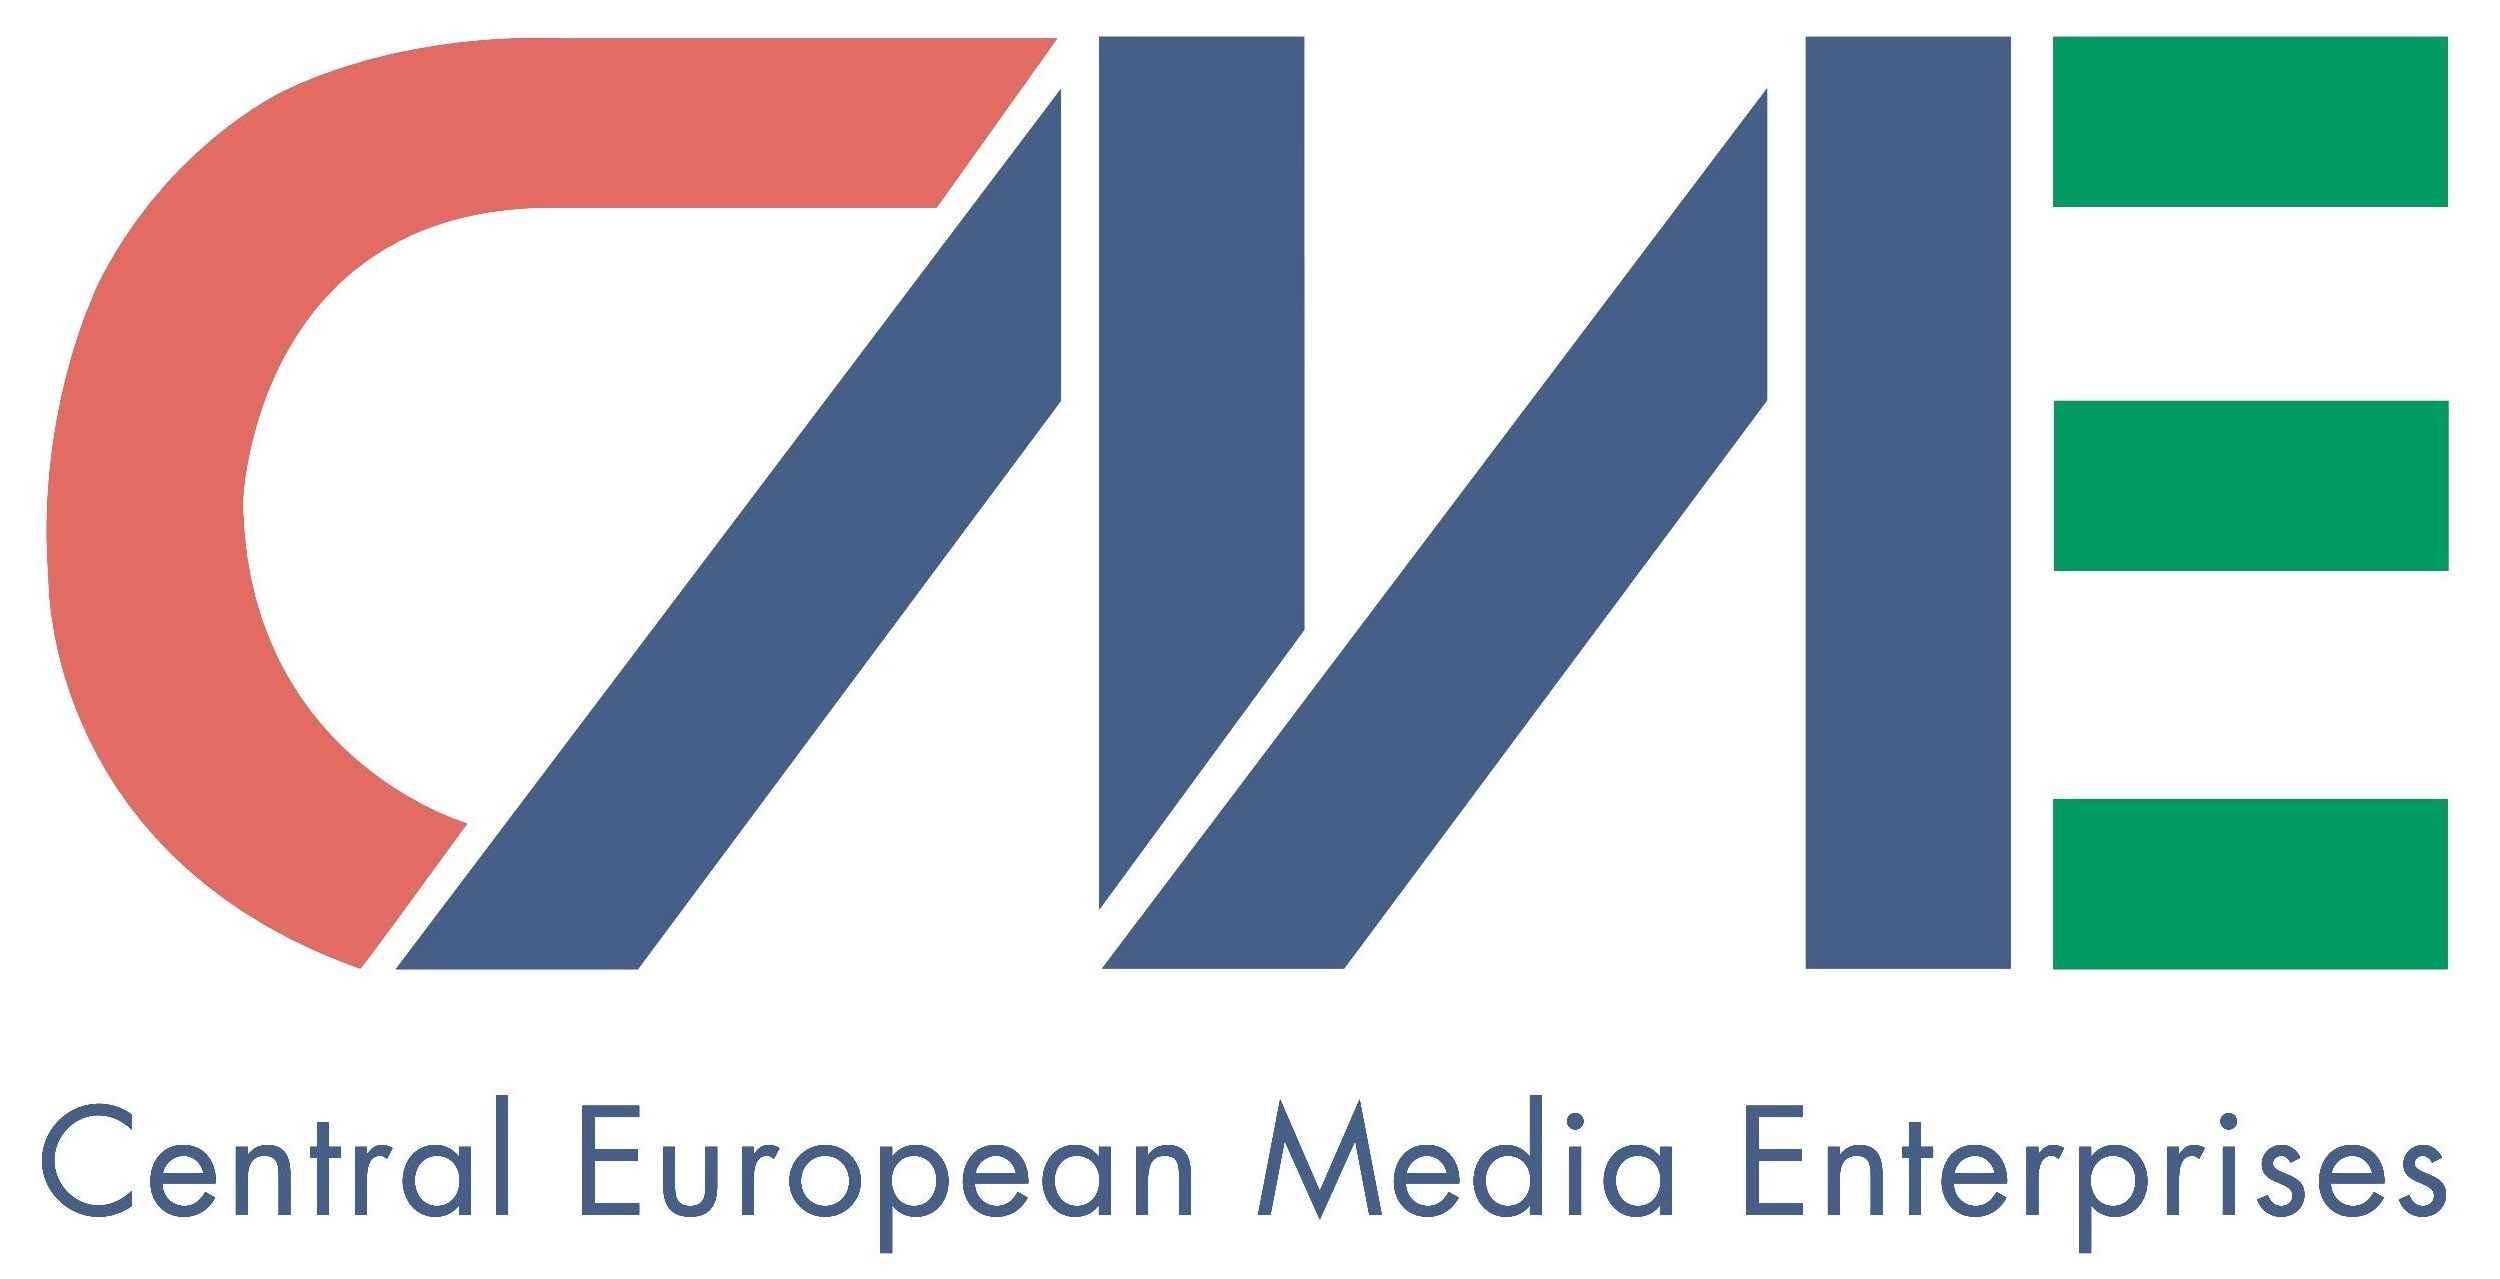 Central-European-Media-Enterprises-Logo